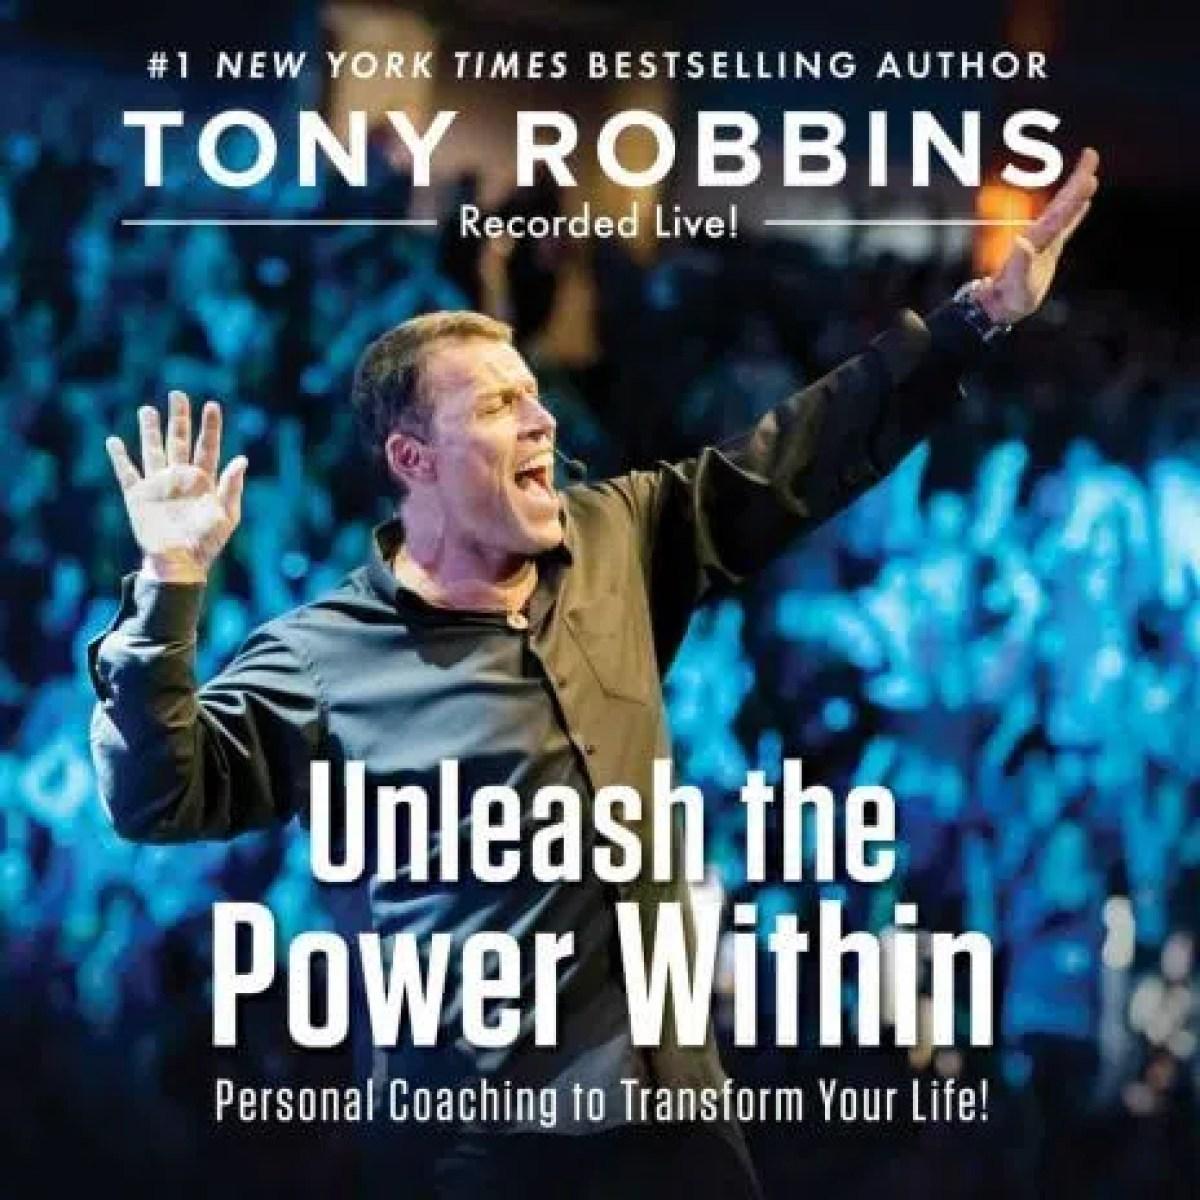 Tony Robbins – Unleash The Power Within